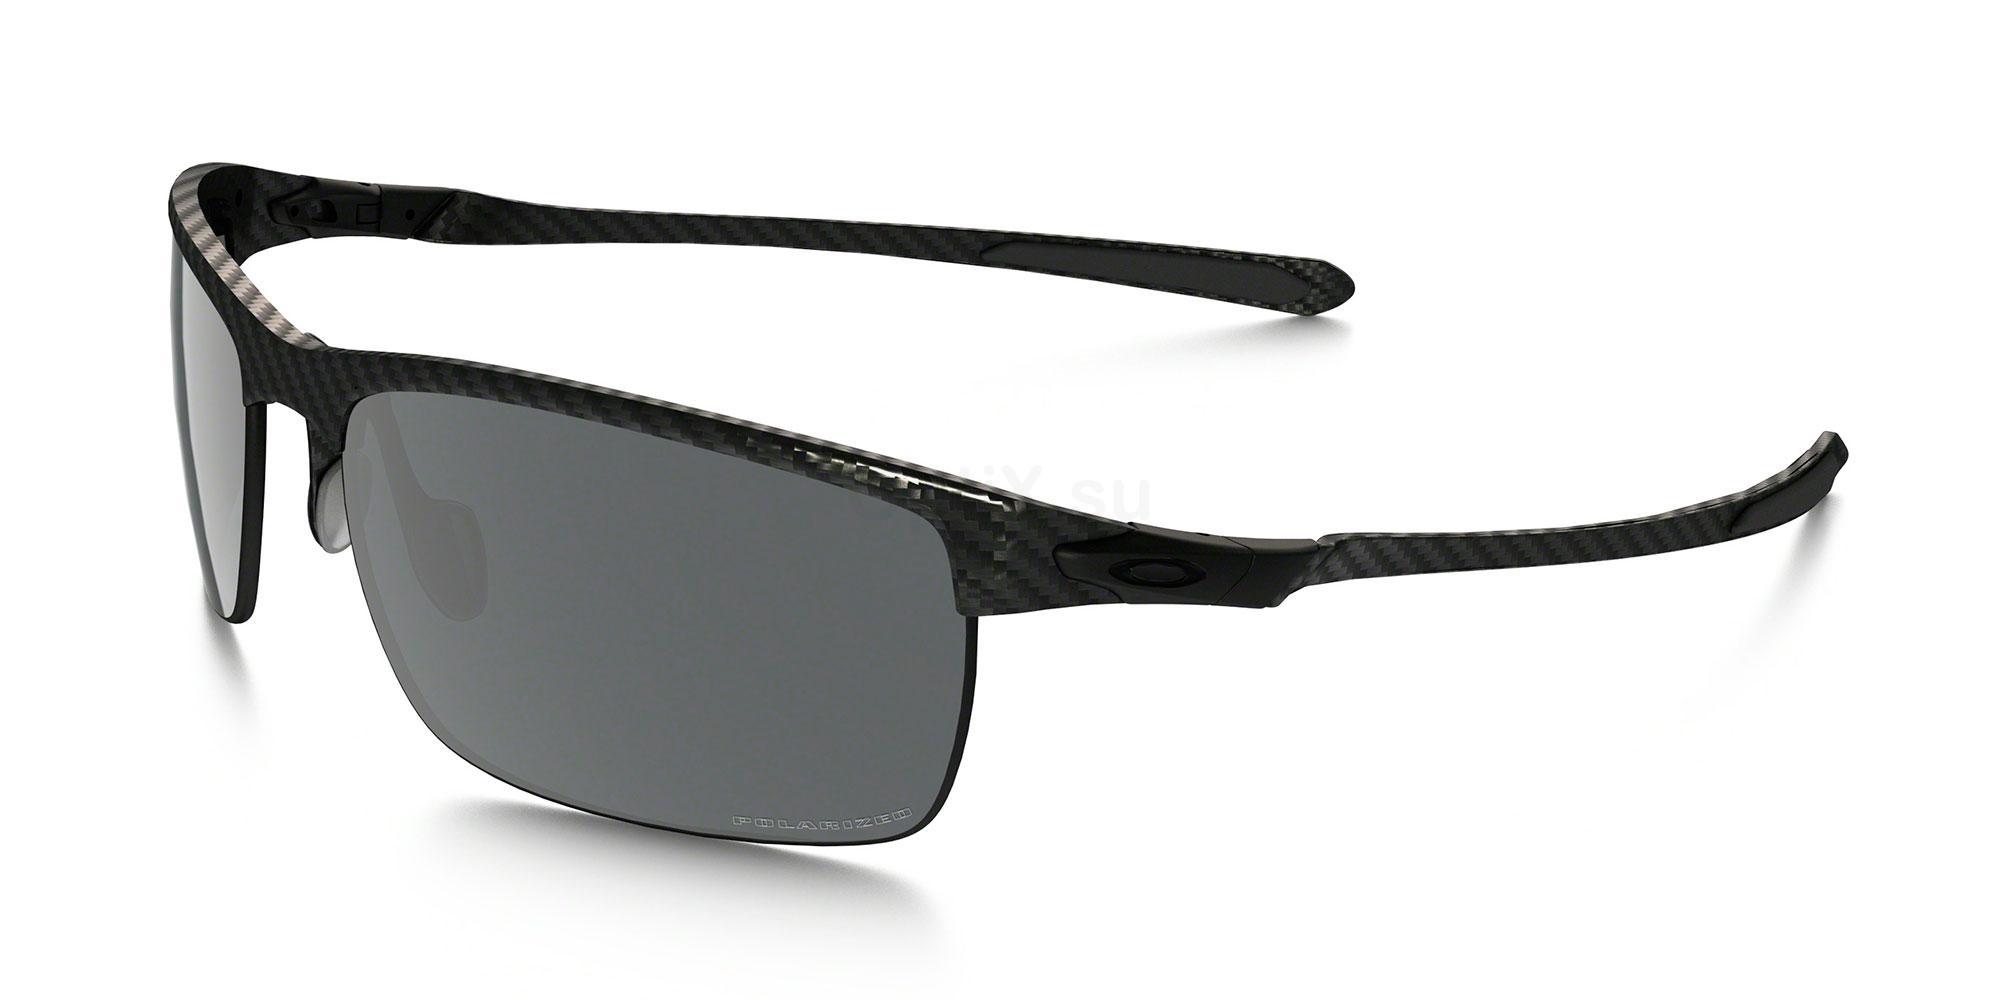 917403 OO9174 CARBON BLADE (Polarized) Sunglasses, Oakley